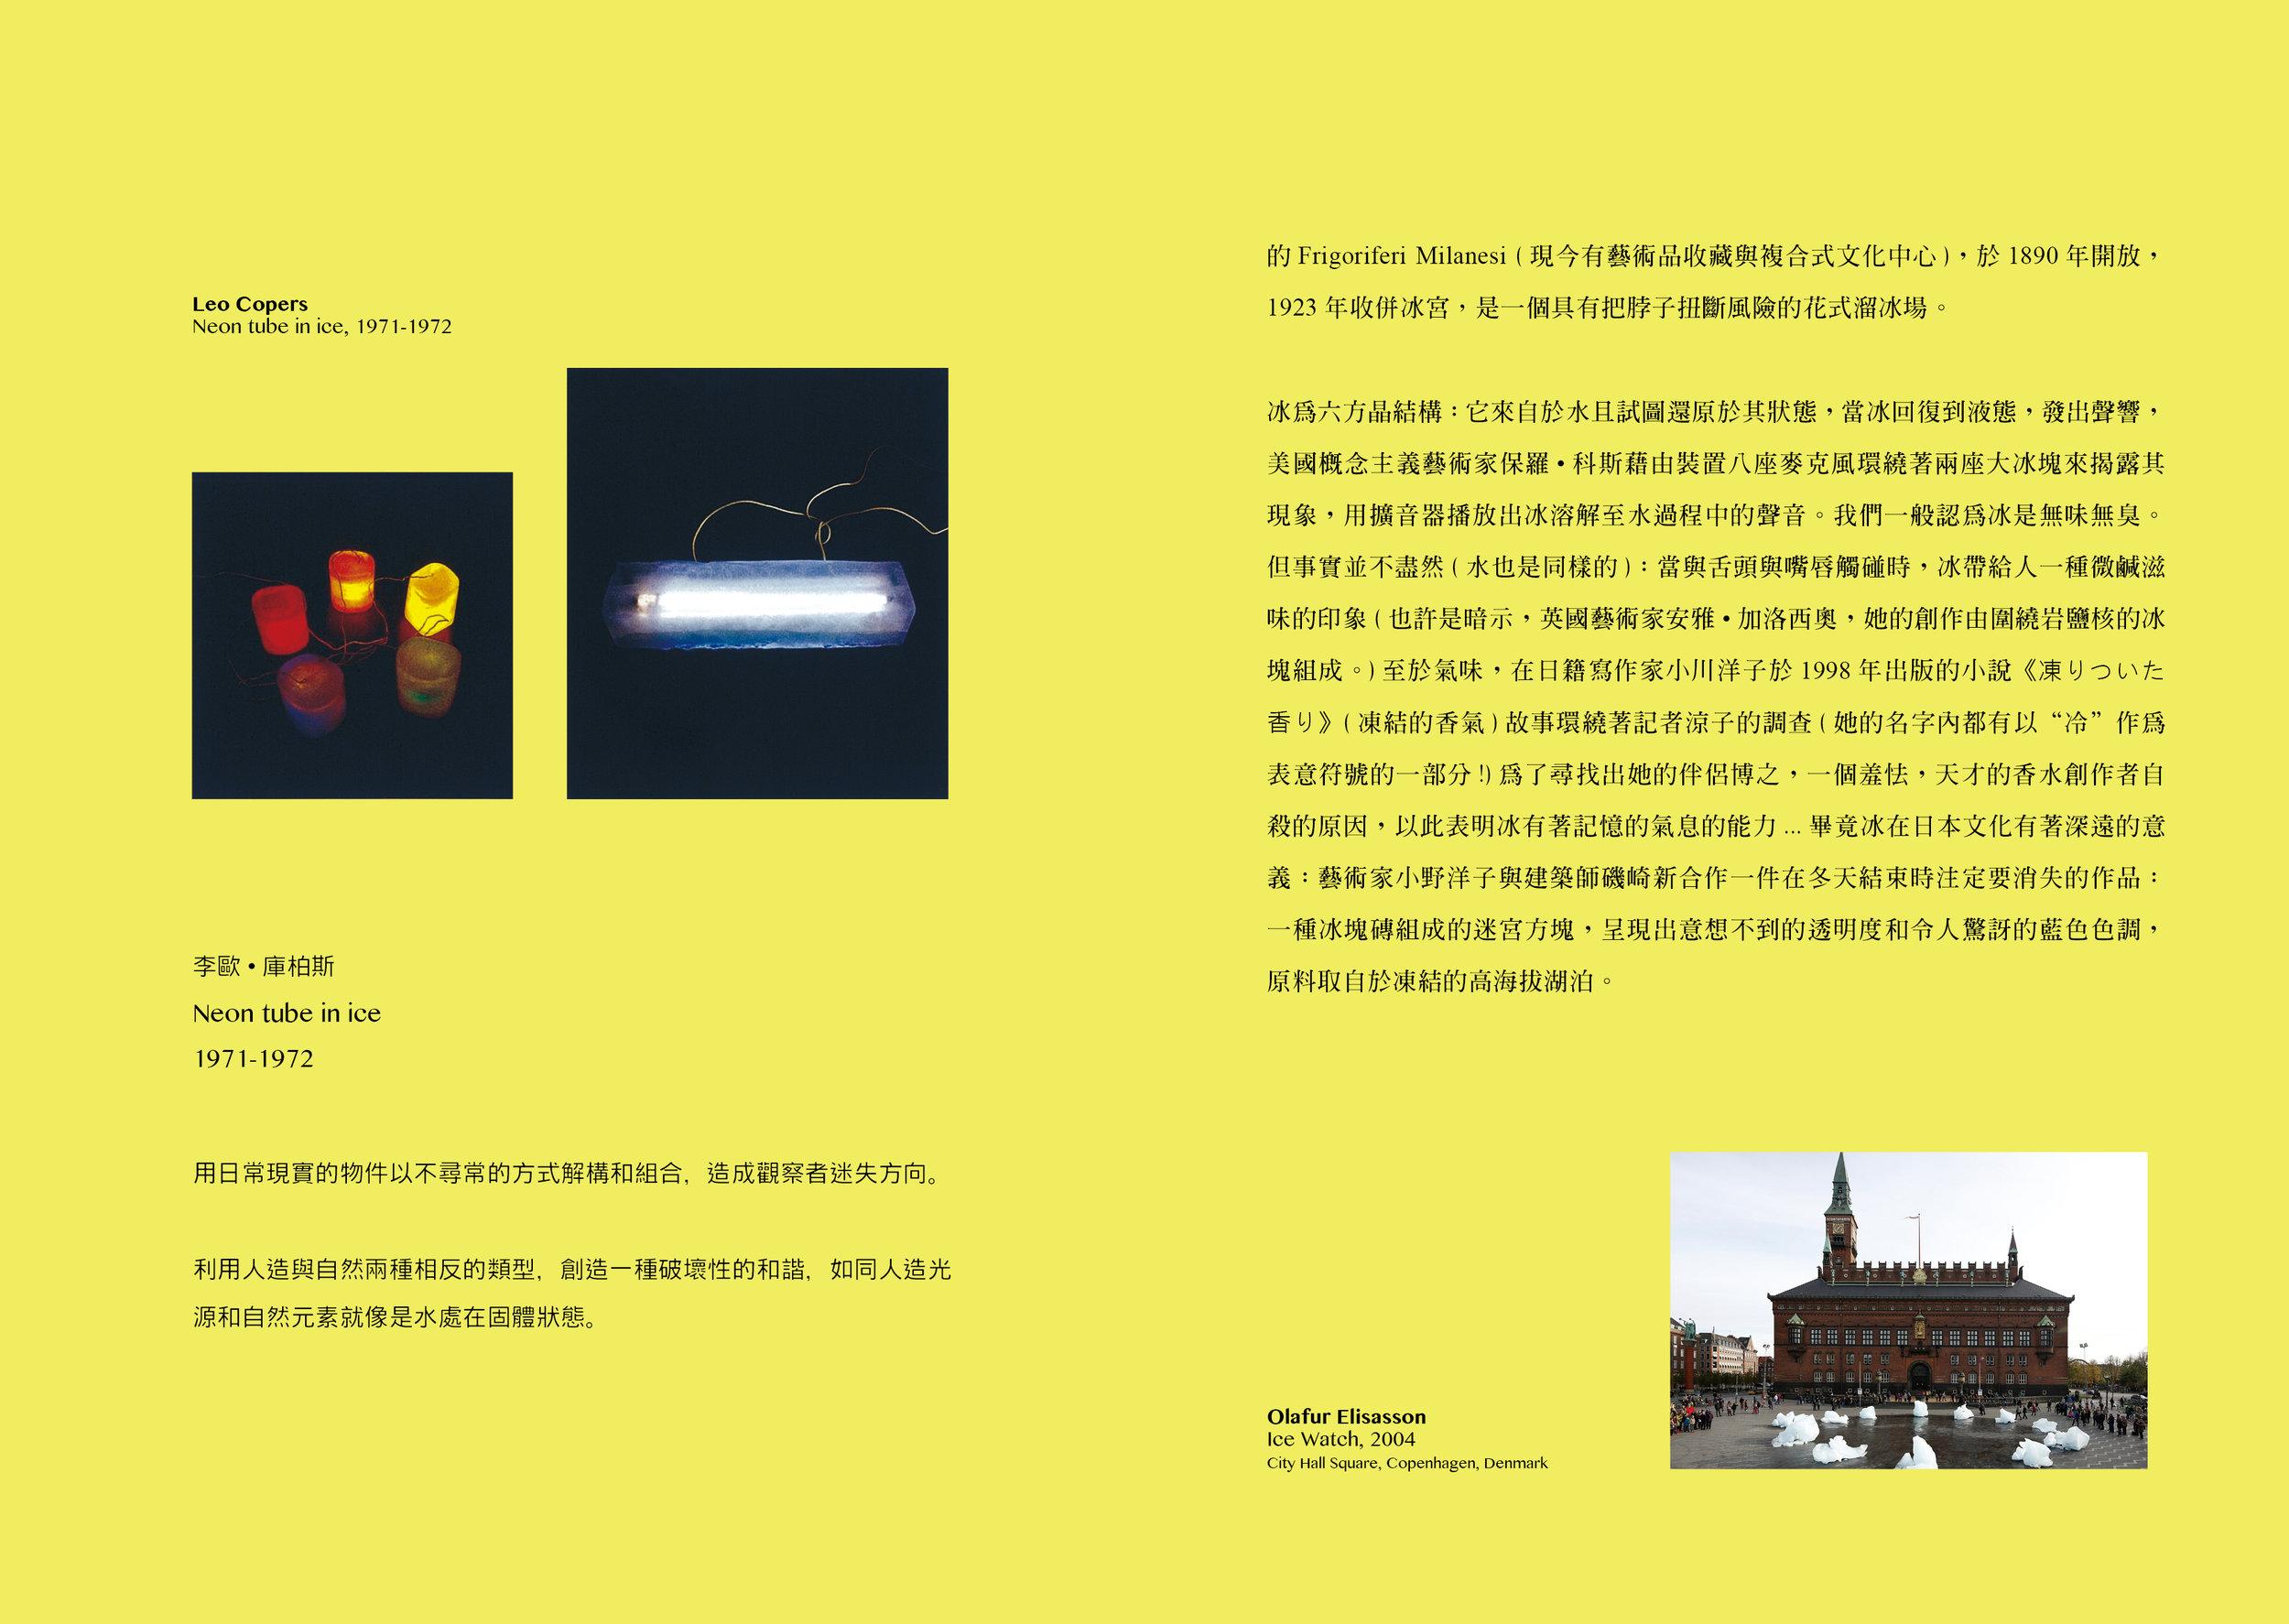 I_as_in_ice_print_yellow4.jpg